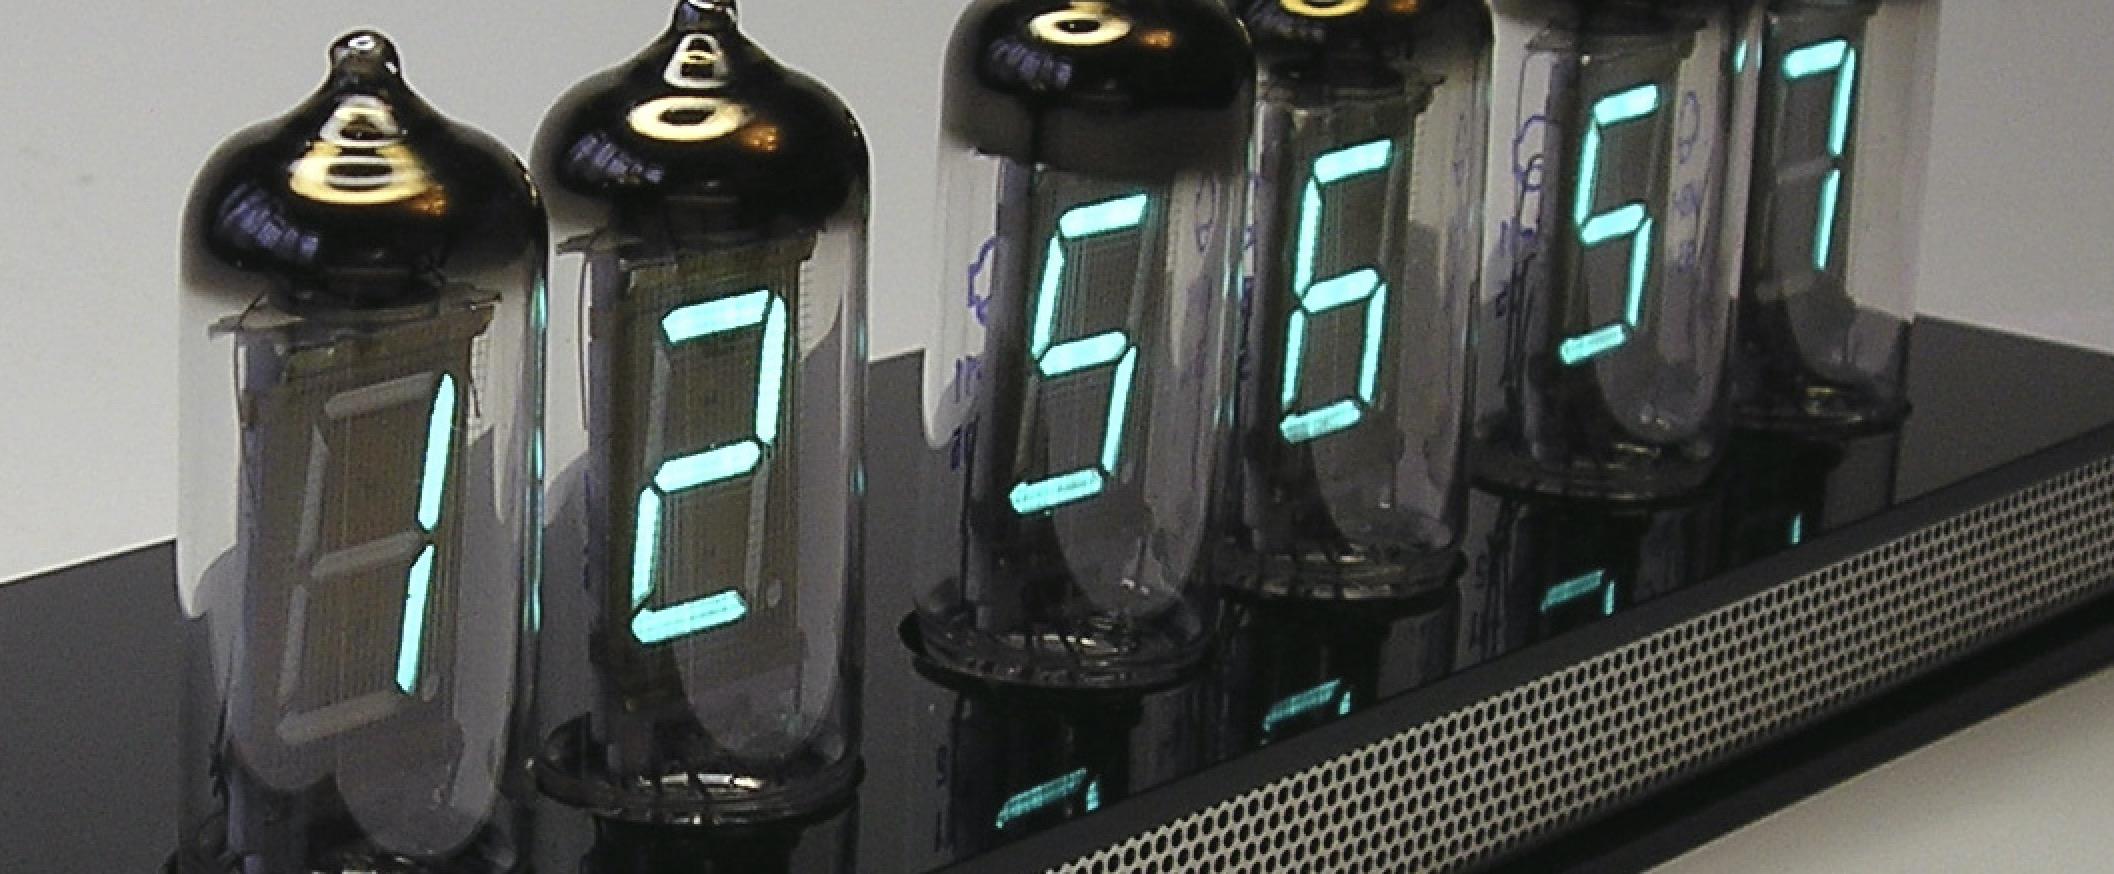 vfd clocks